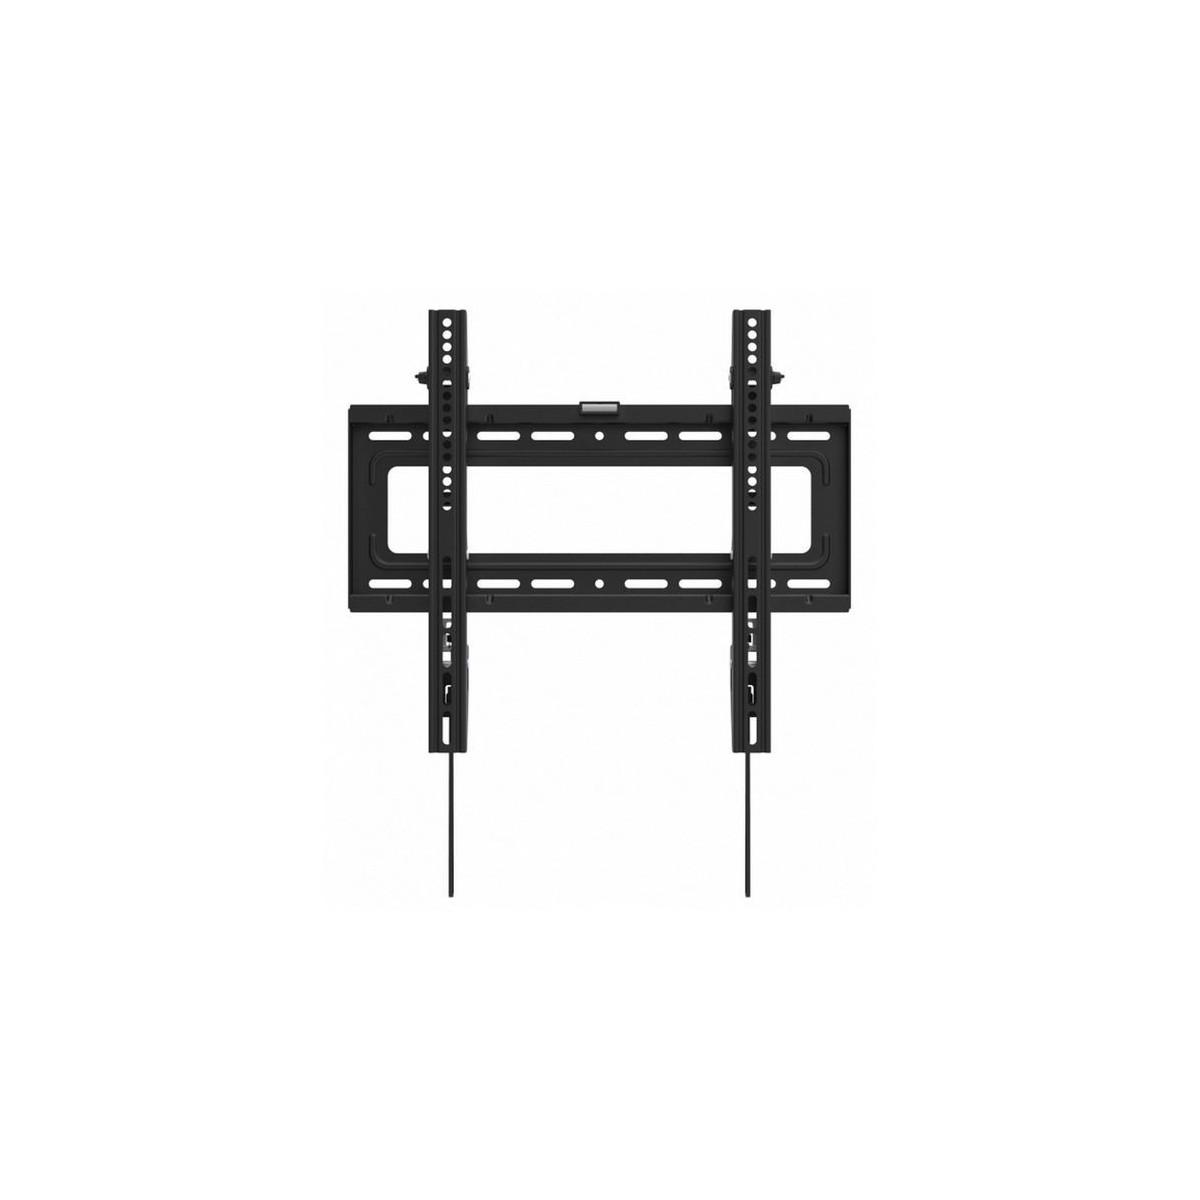 Soporte pared TV Fonestar STV7344N, negro, inclina